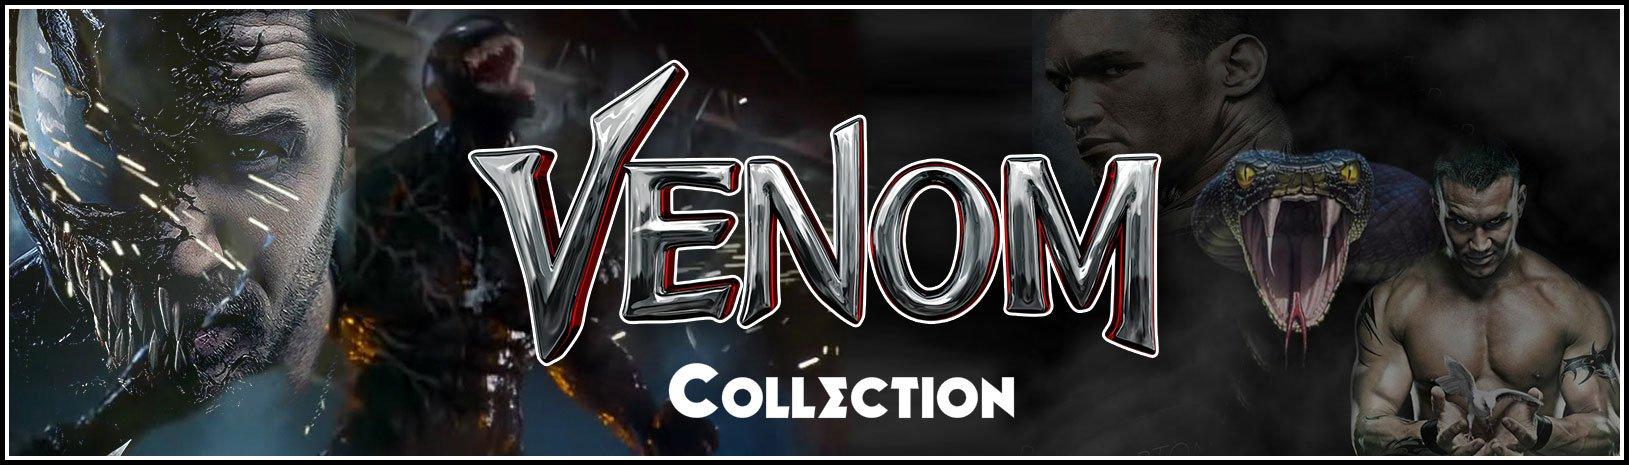 venom merchandise